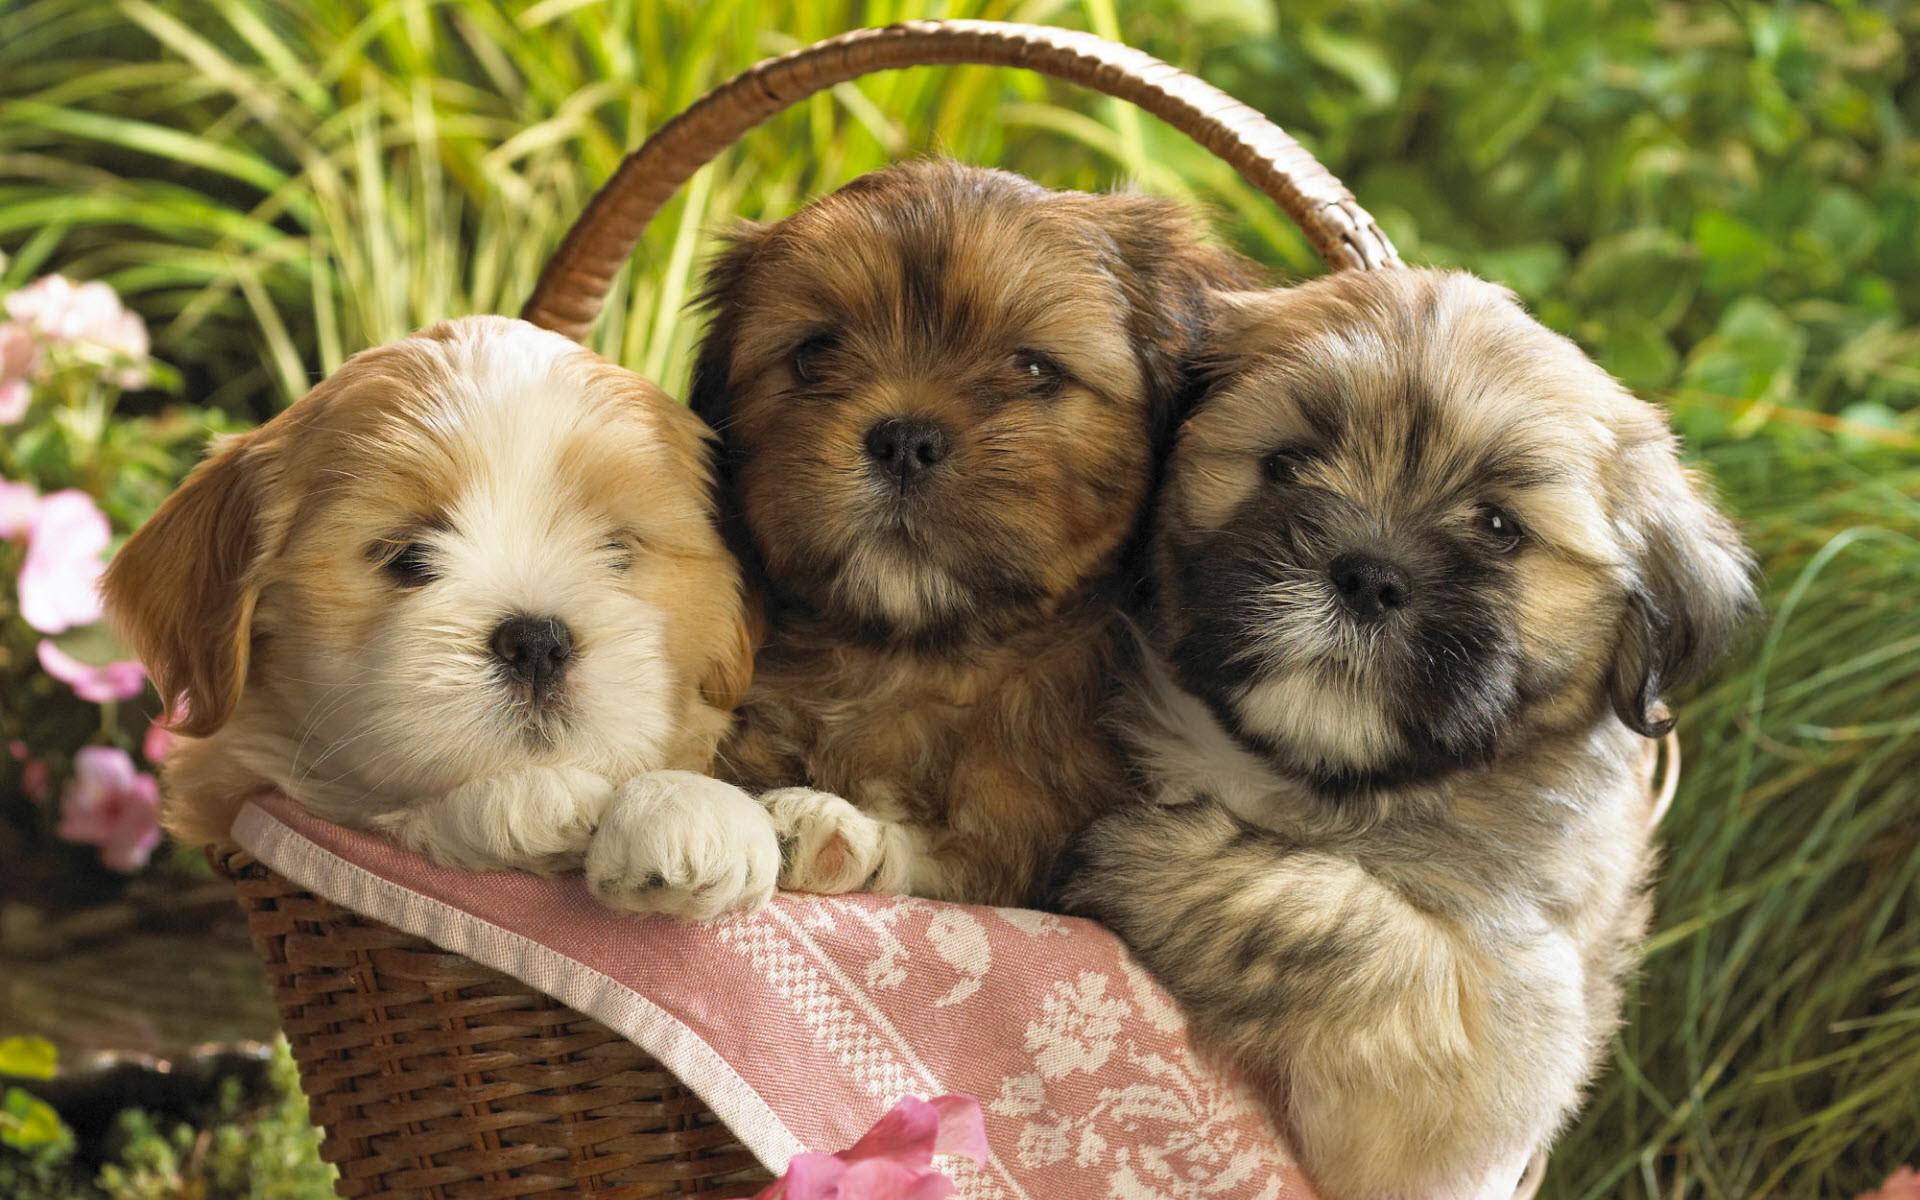 Cute Puppies in a basket Wallpaper